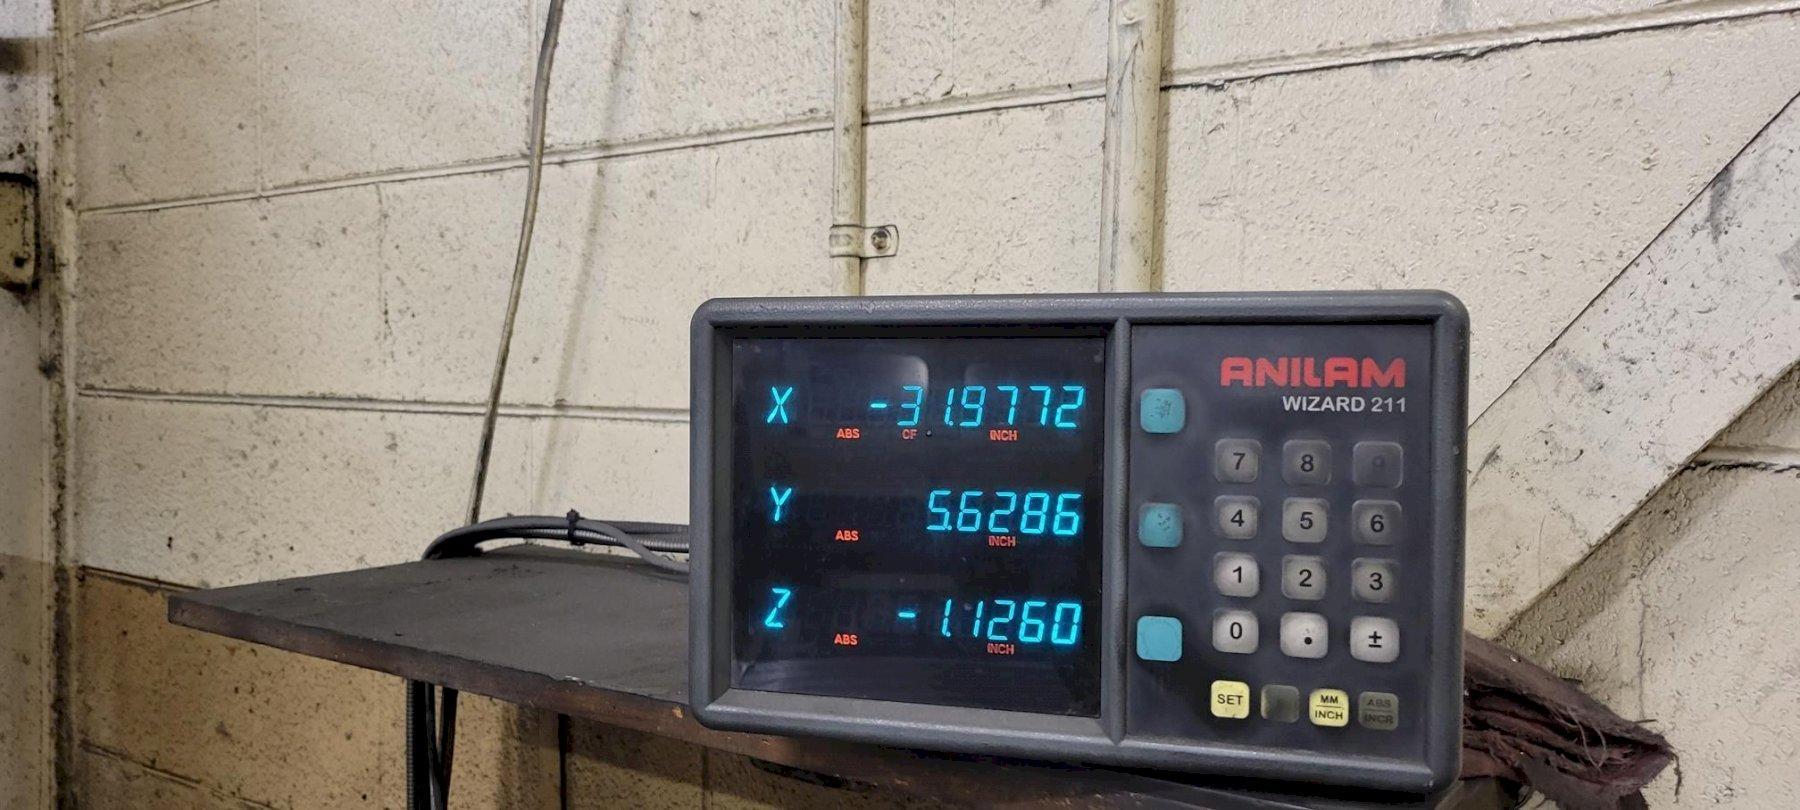 "4"" DEVLIEG 4H-120 HORIZONTAL BORING JIG MILL. STOCK # 0736721"